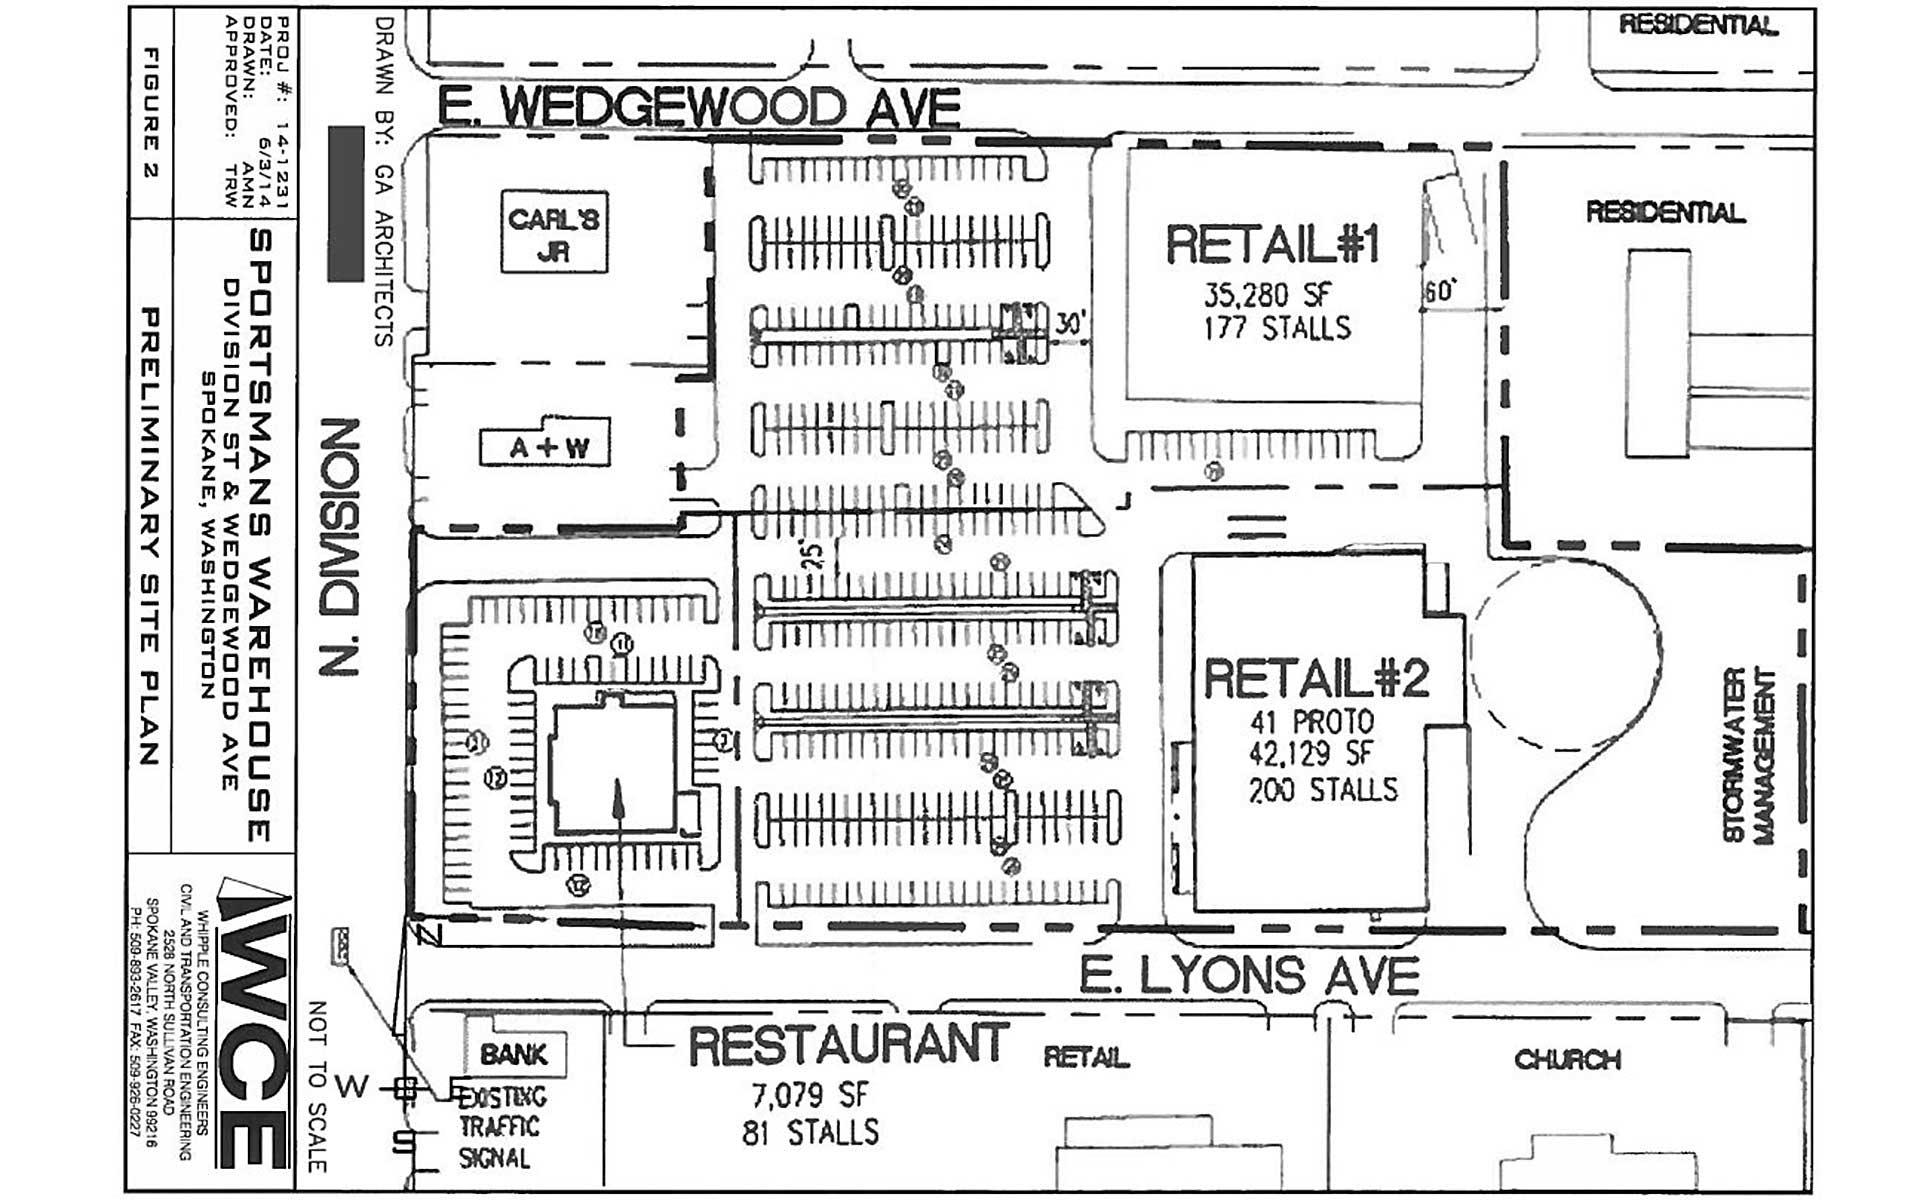 Sportsman S Warehouse To Bring Economic Boost To Spokane